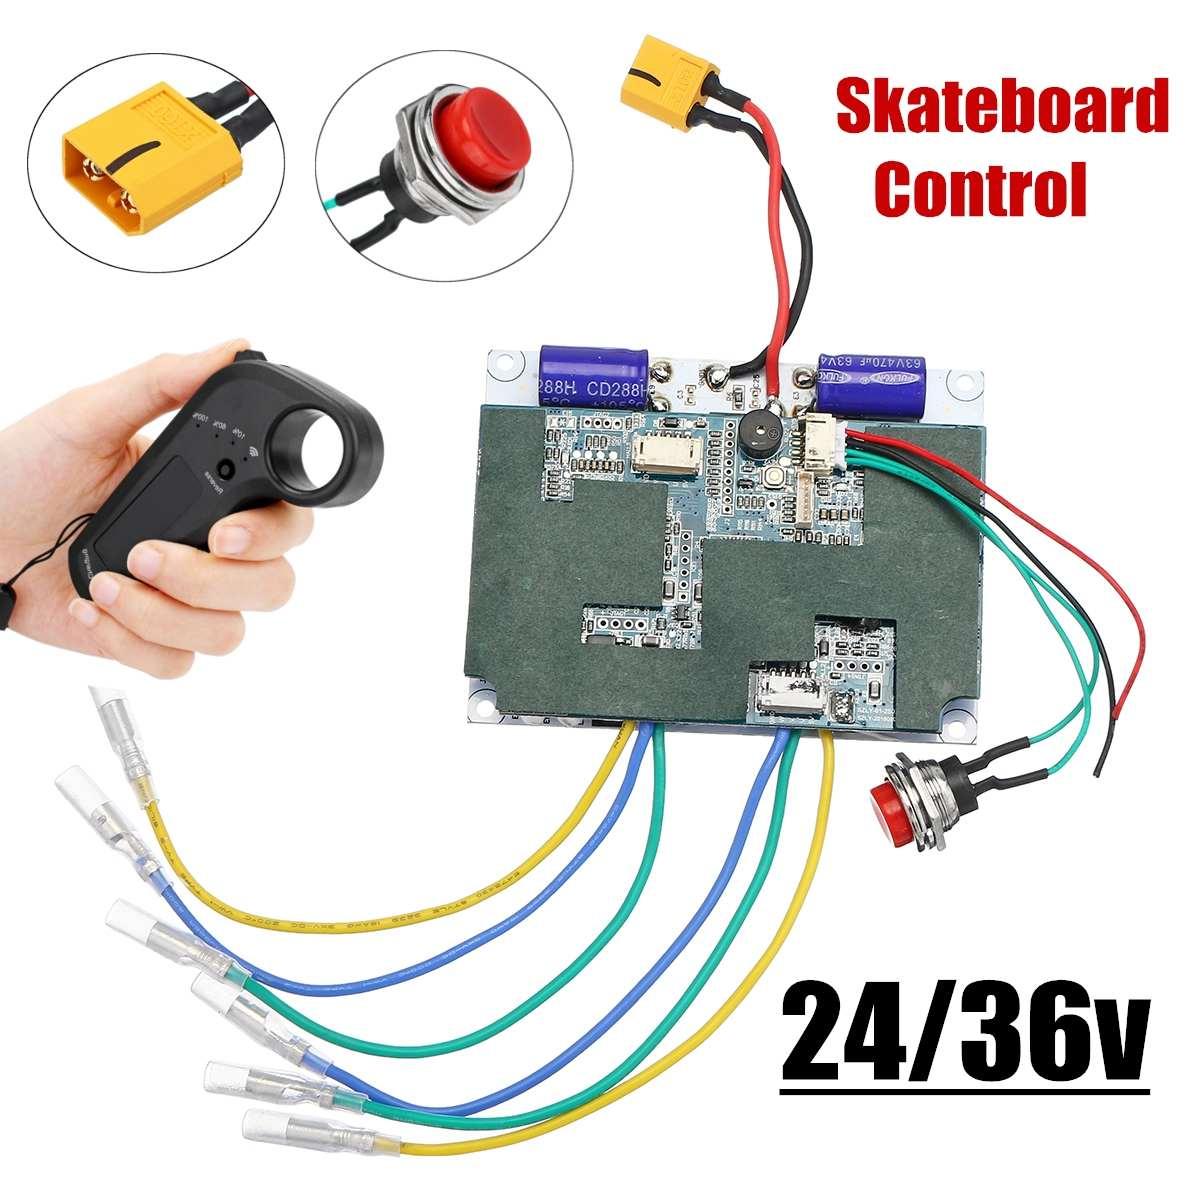 24V/36V Electric Skateboard Controller Longboard Remote Dual Motors W/ Remote ESC Substitute Parts Scooters Skate Board Accessor